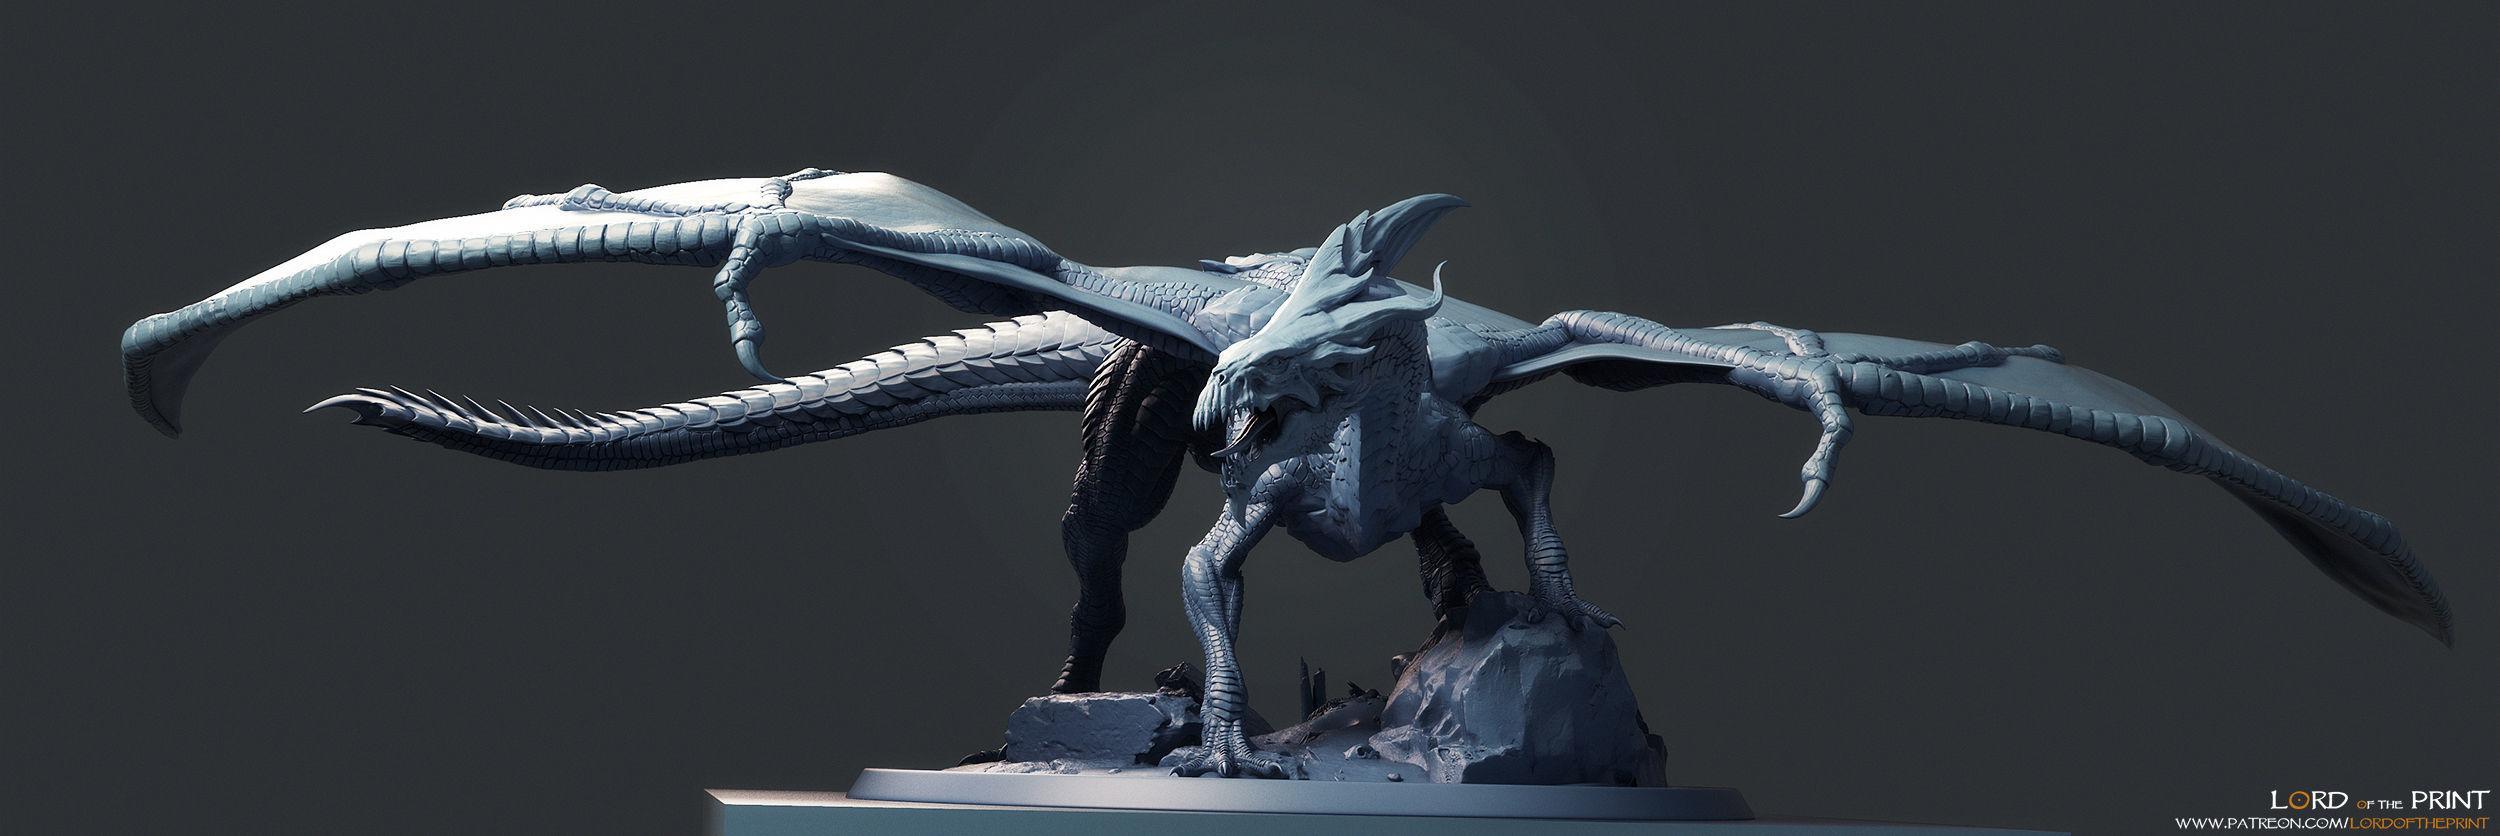 Adult White Dragon